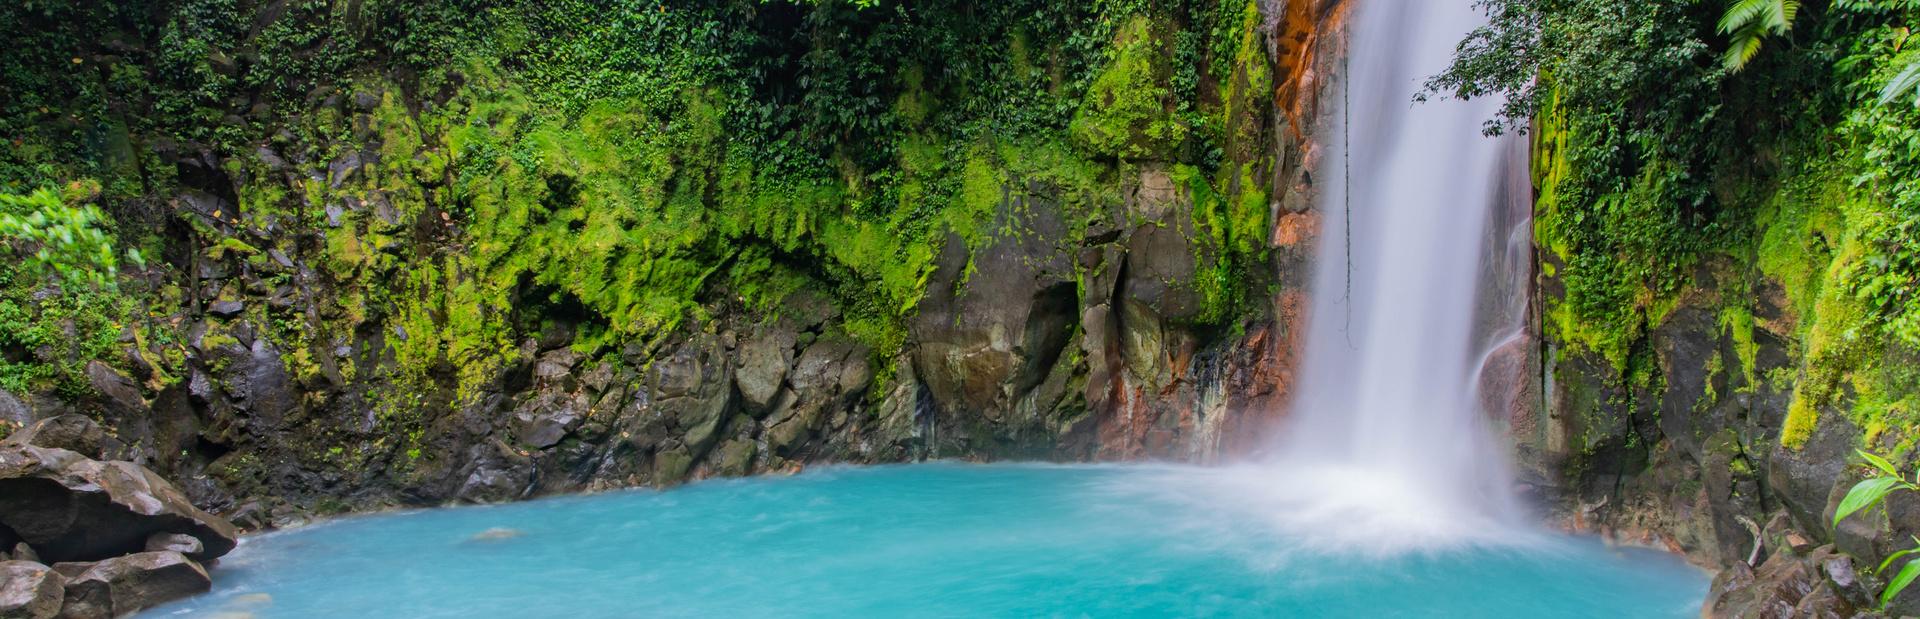 Costa Rica news photo